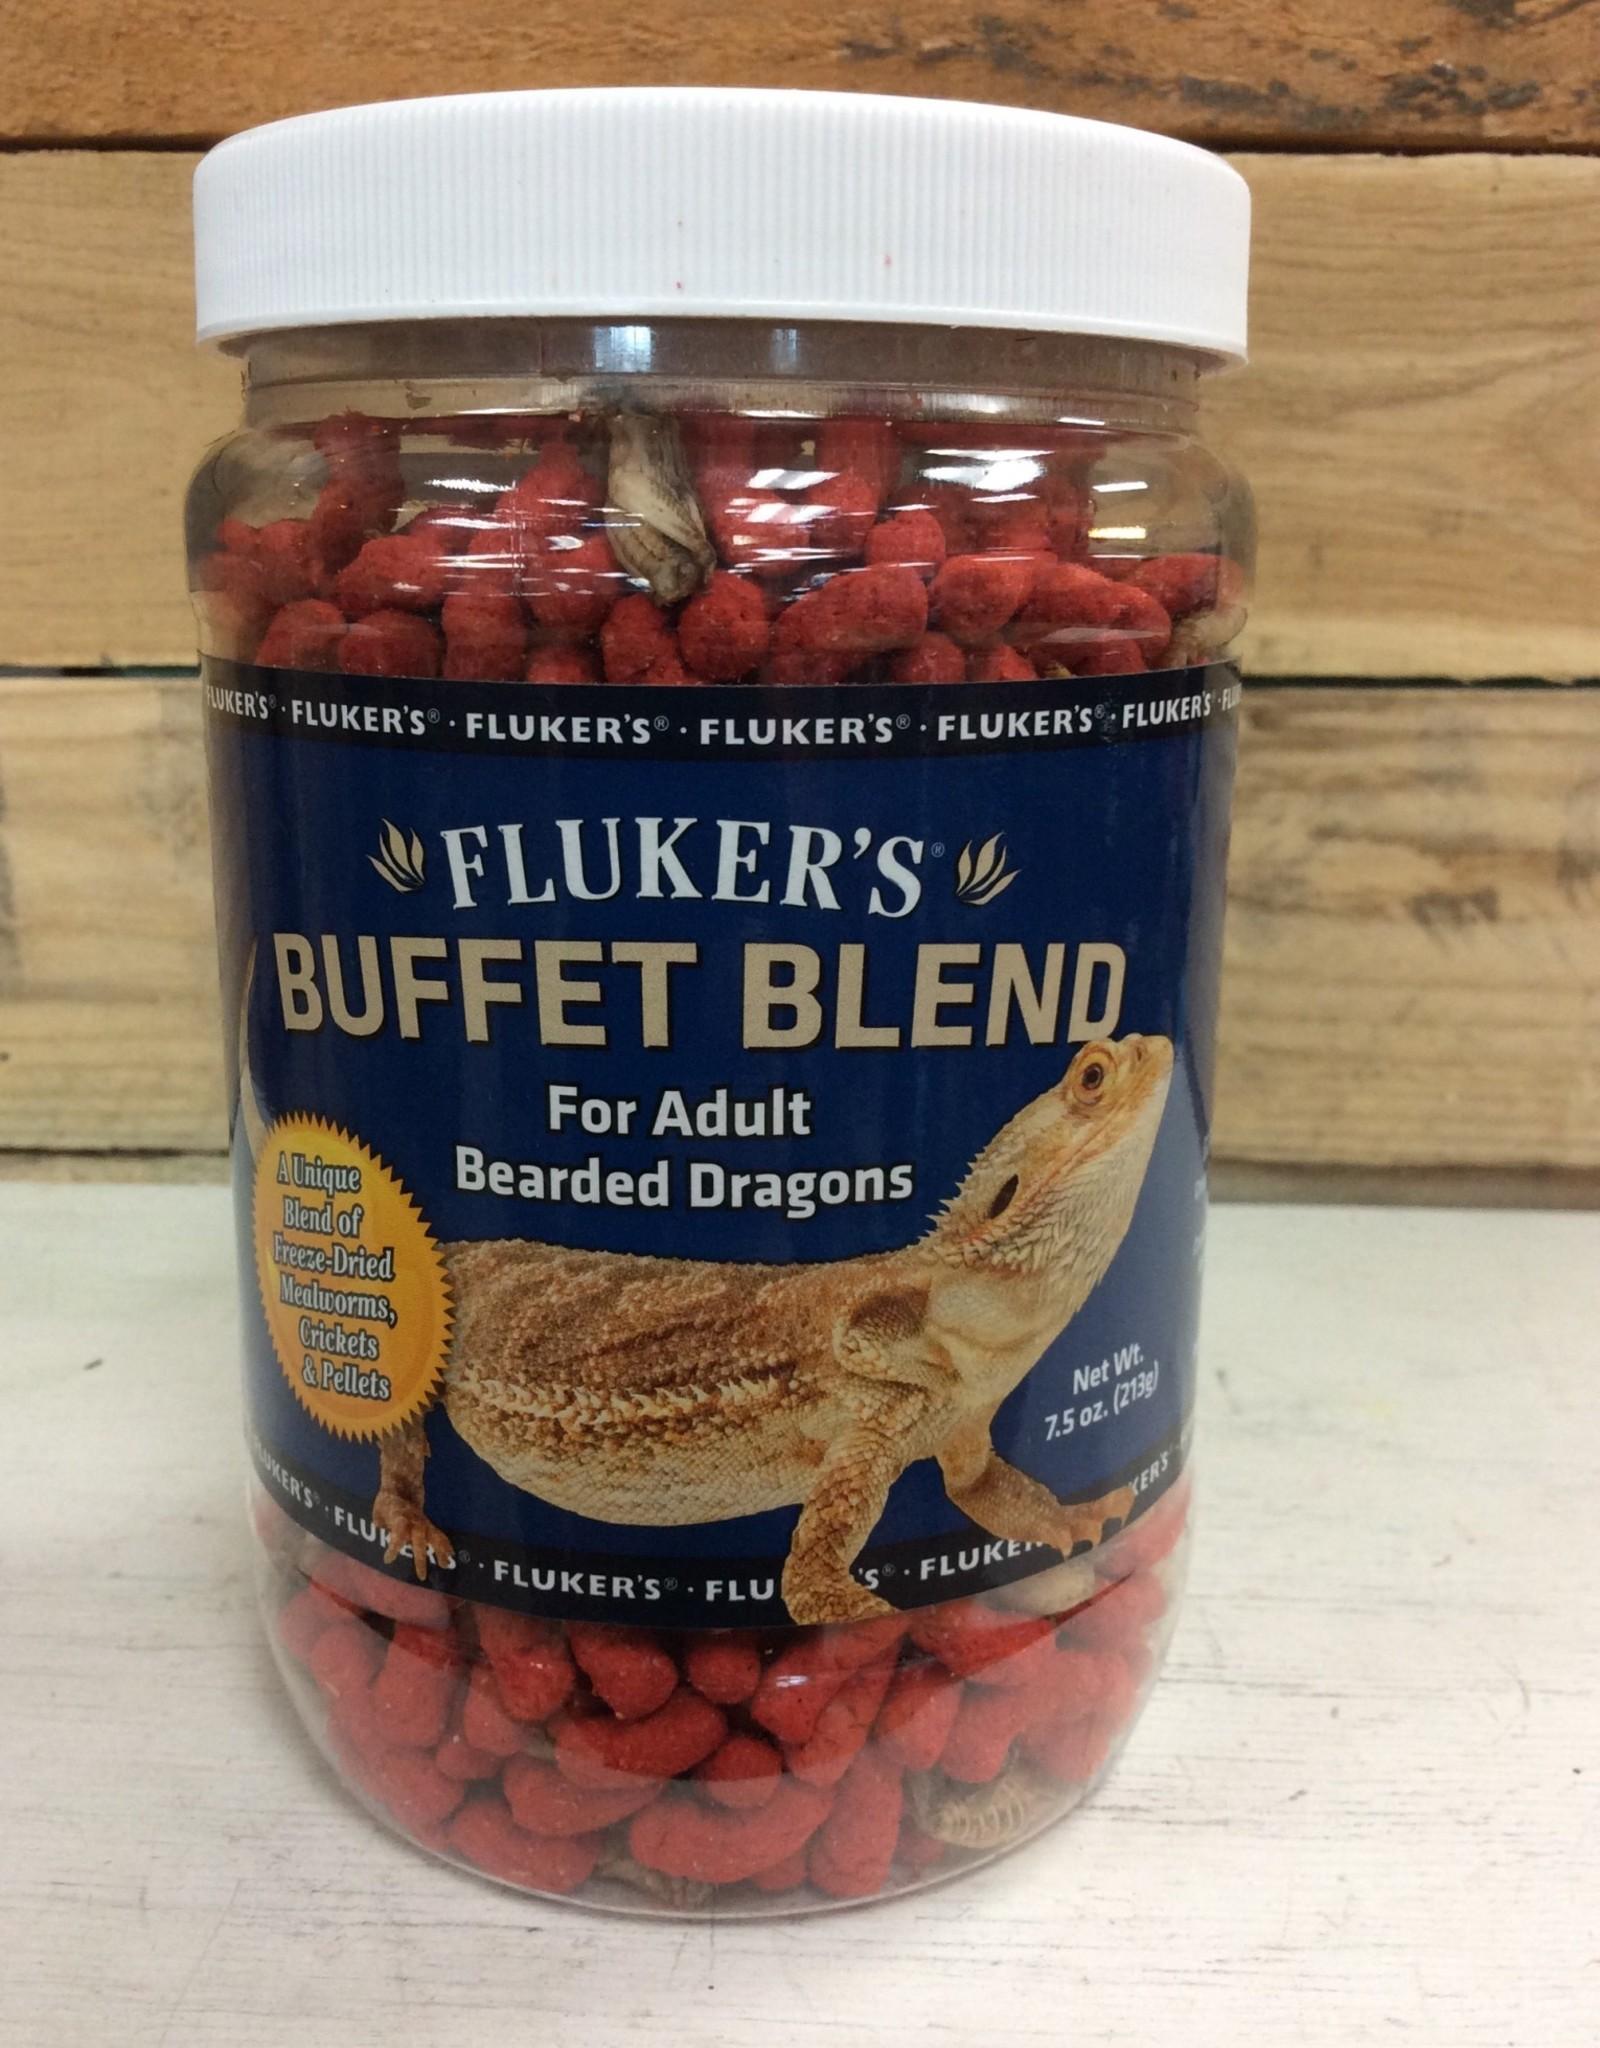 Fluker 7.5 OZ. BUFFET BLEND ADULT BEARDED DRAGON